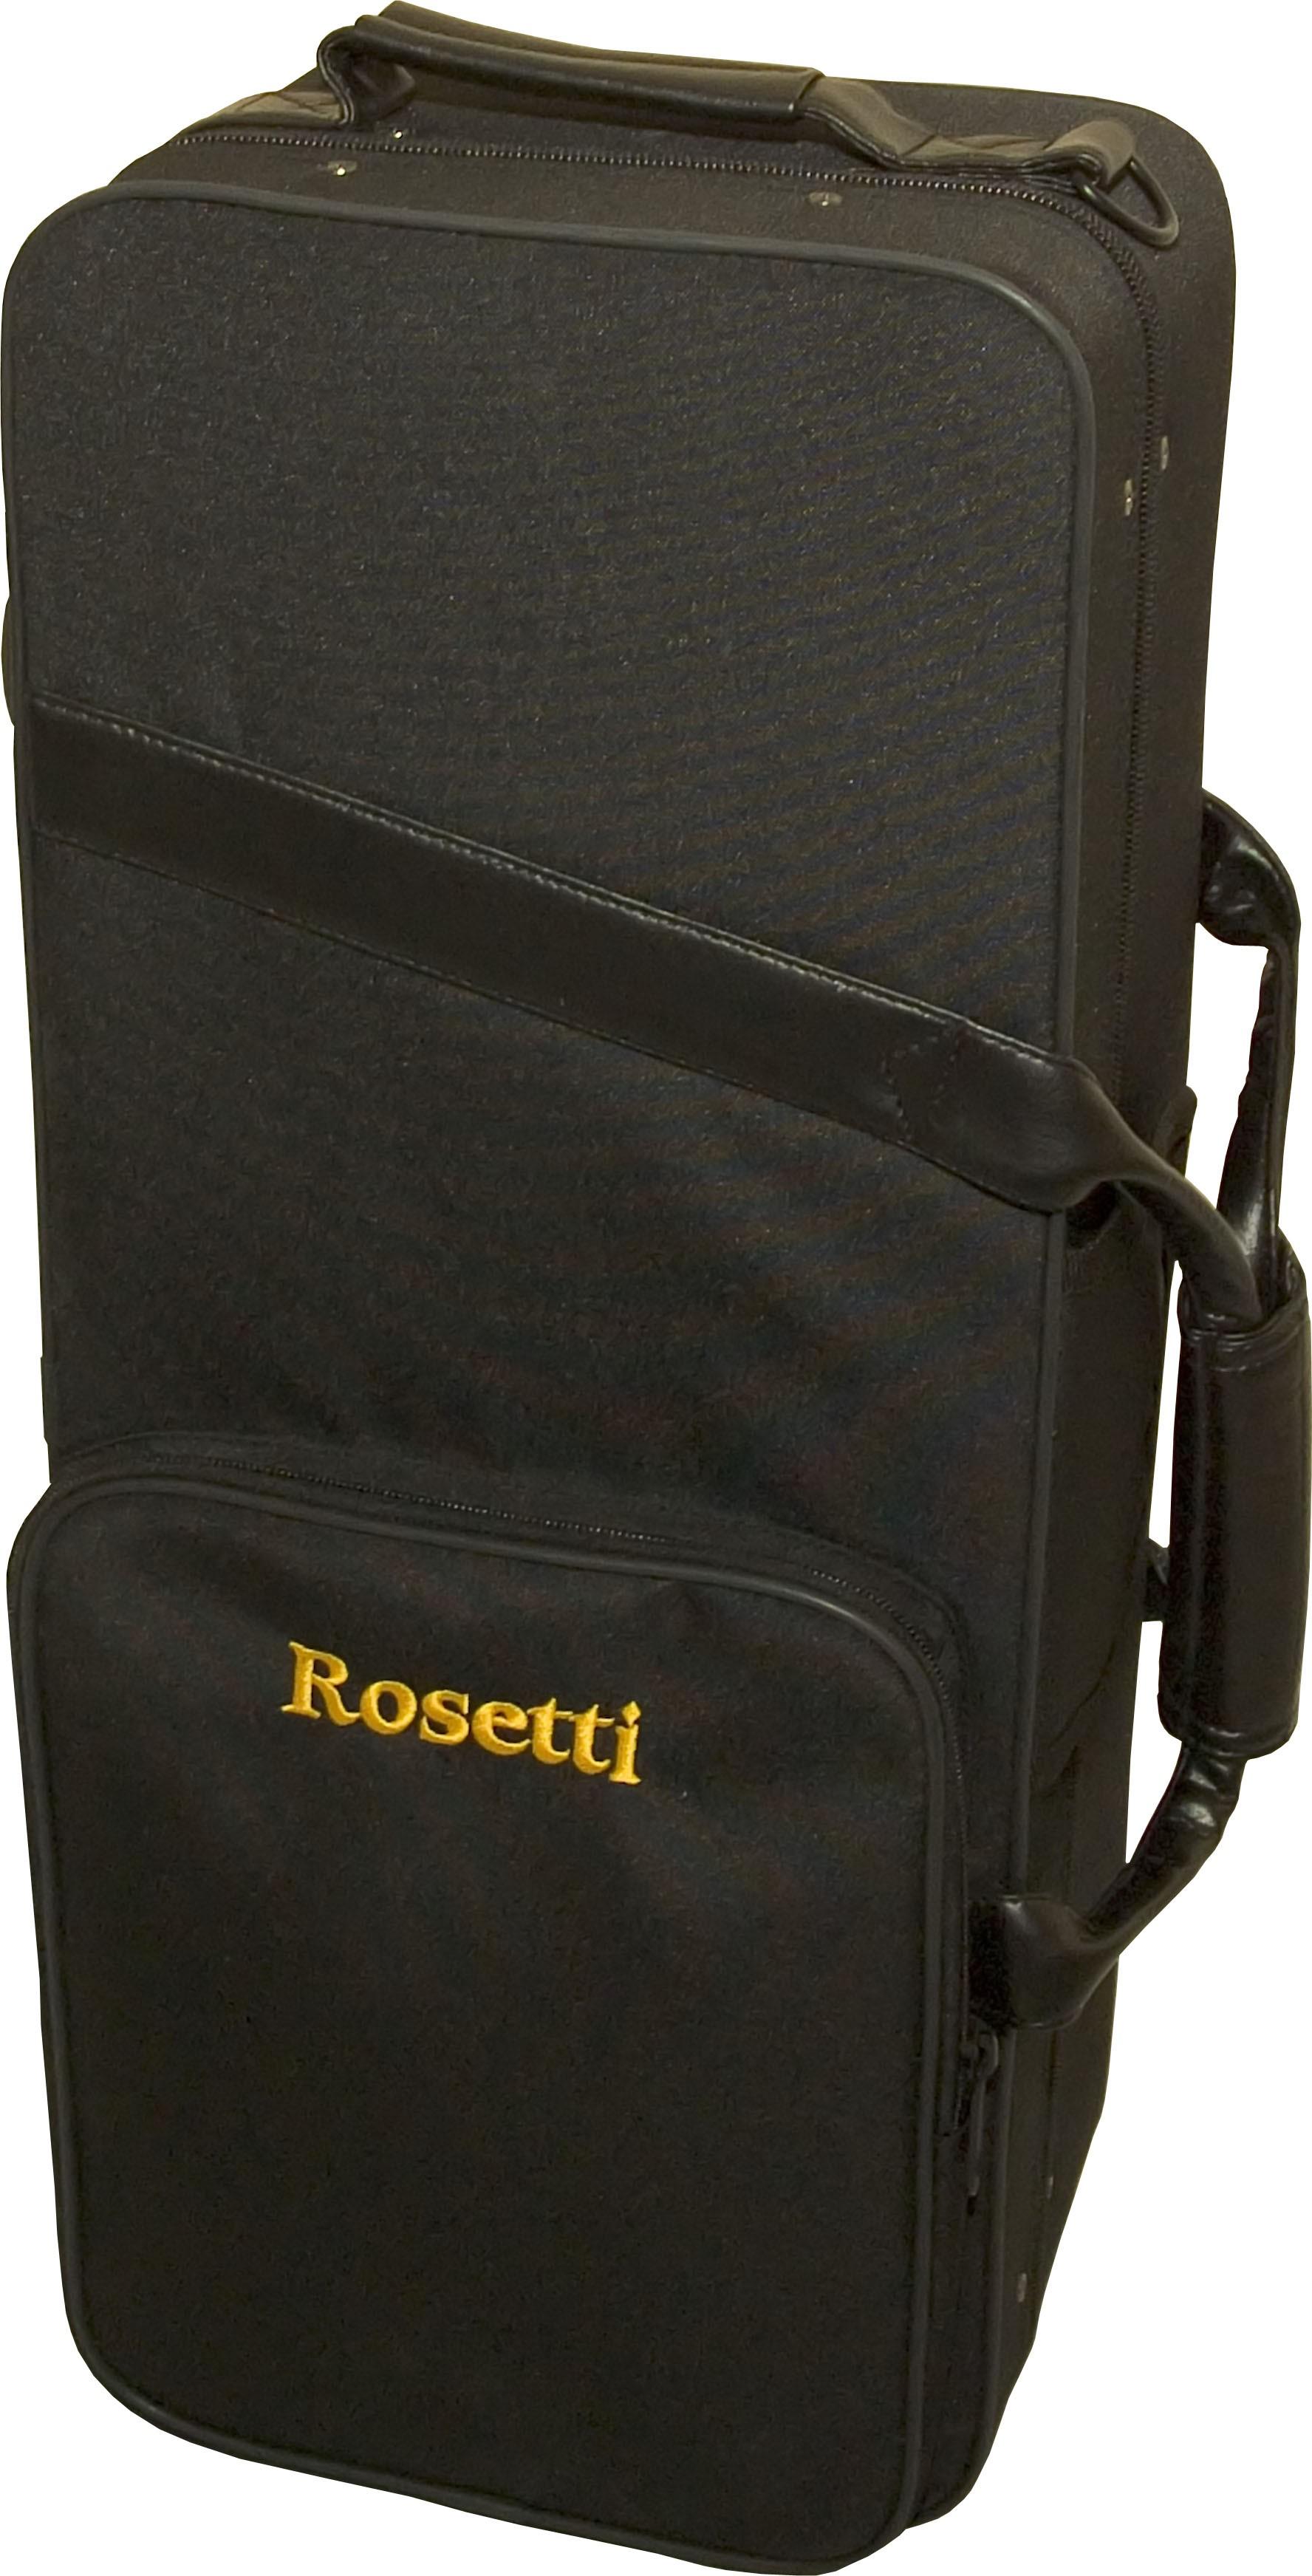 Rosetti Trumpet Case